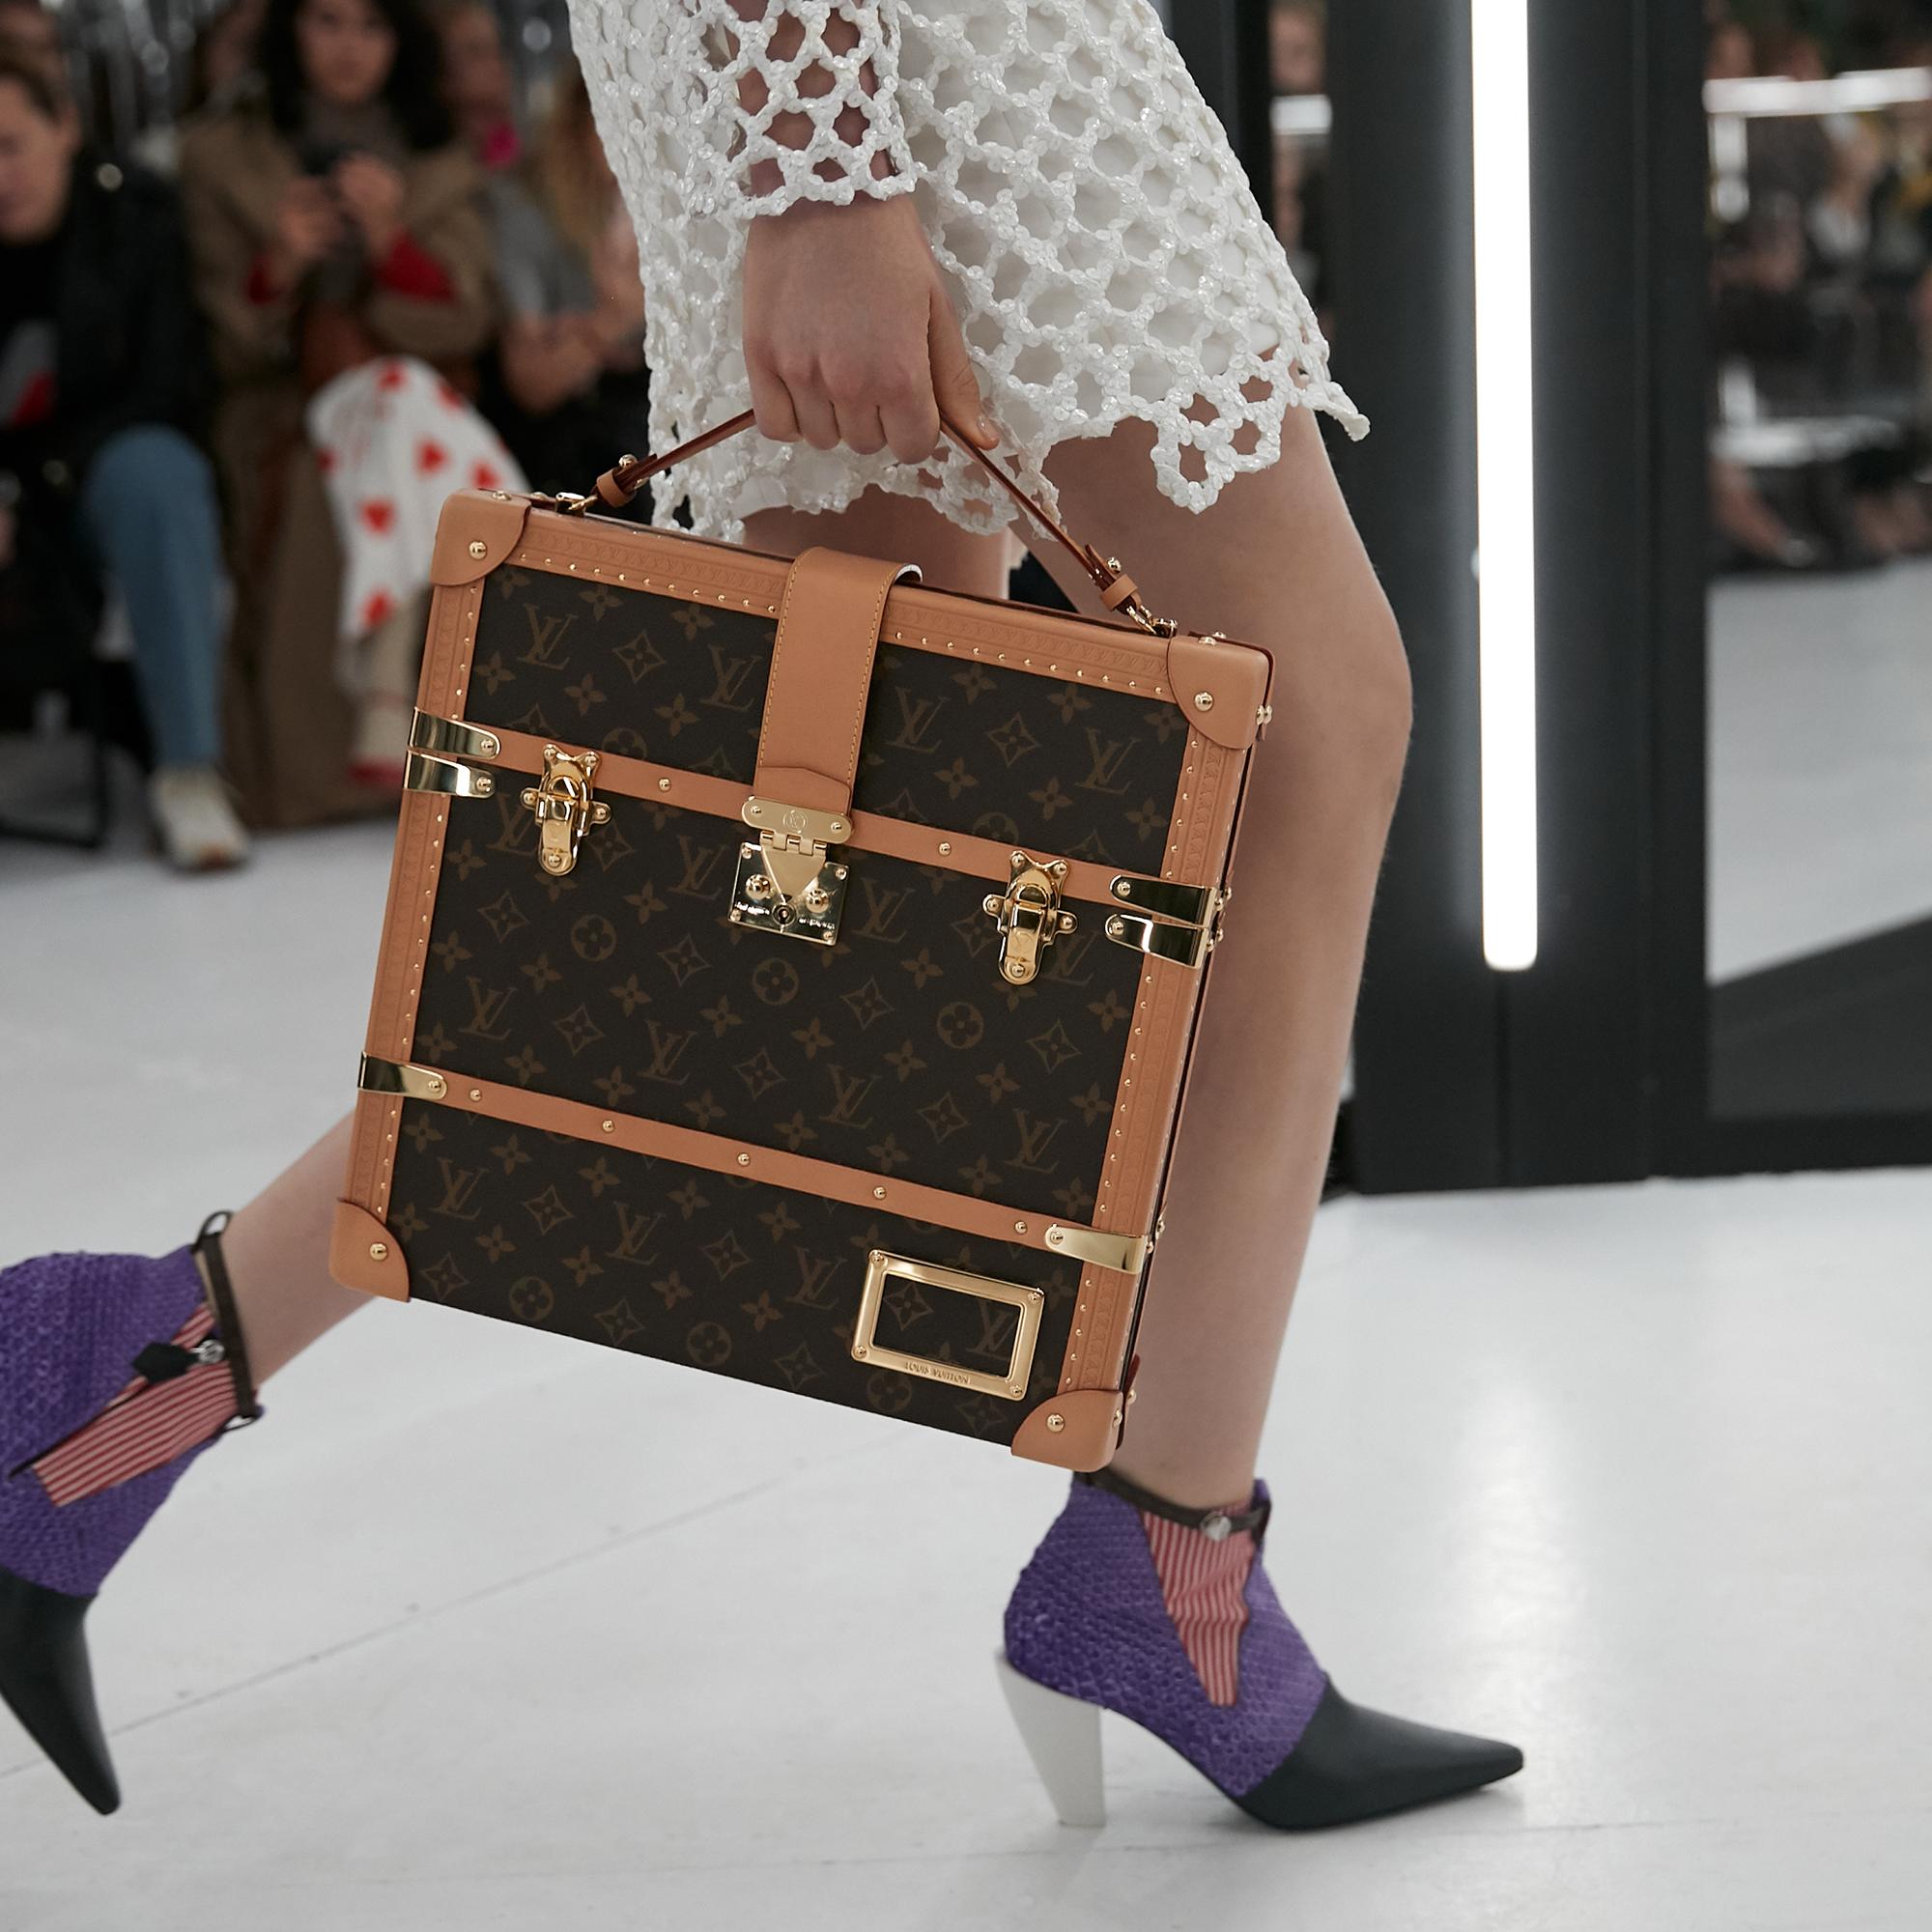 9488c27a85aa A Monogram handbag from the Louis Vuitton Women s Spring-Summer 2019  Fashion Show